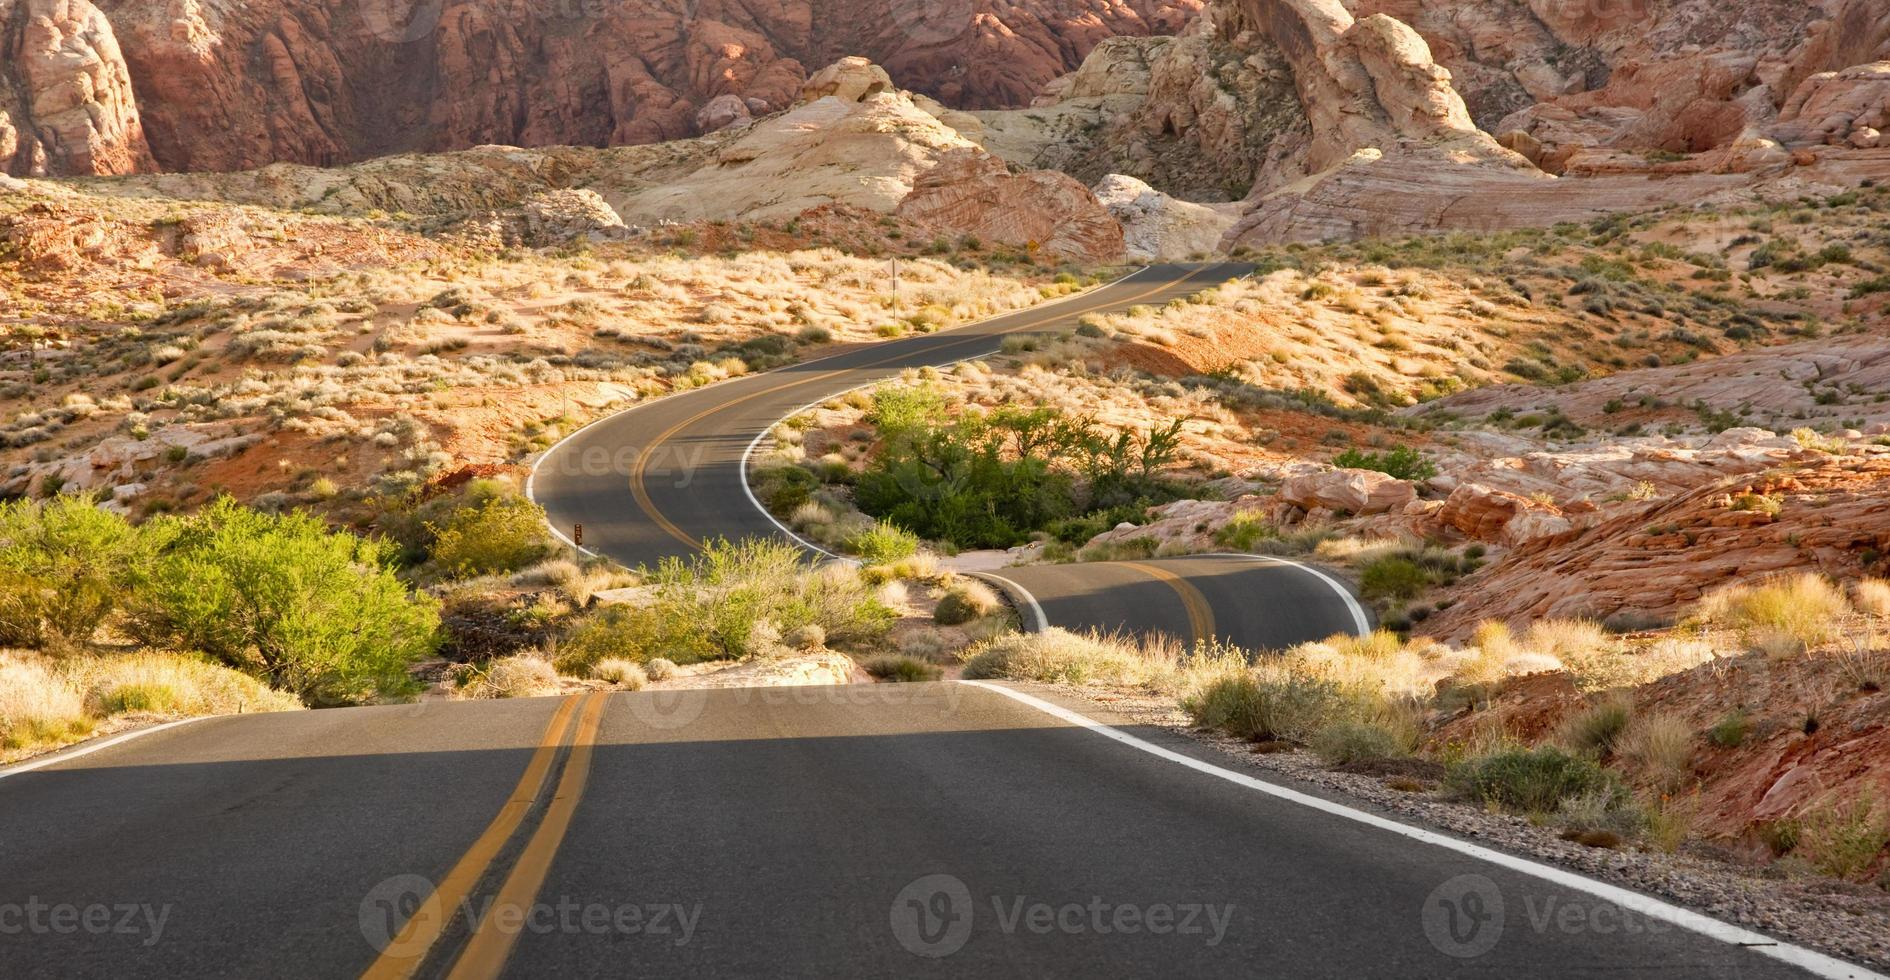 estrada deserta desconectada foto